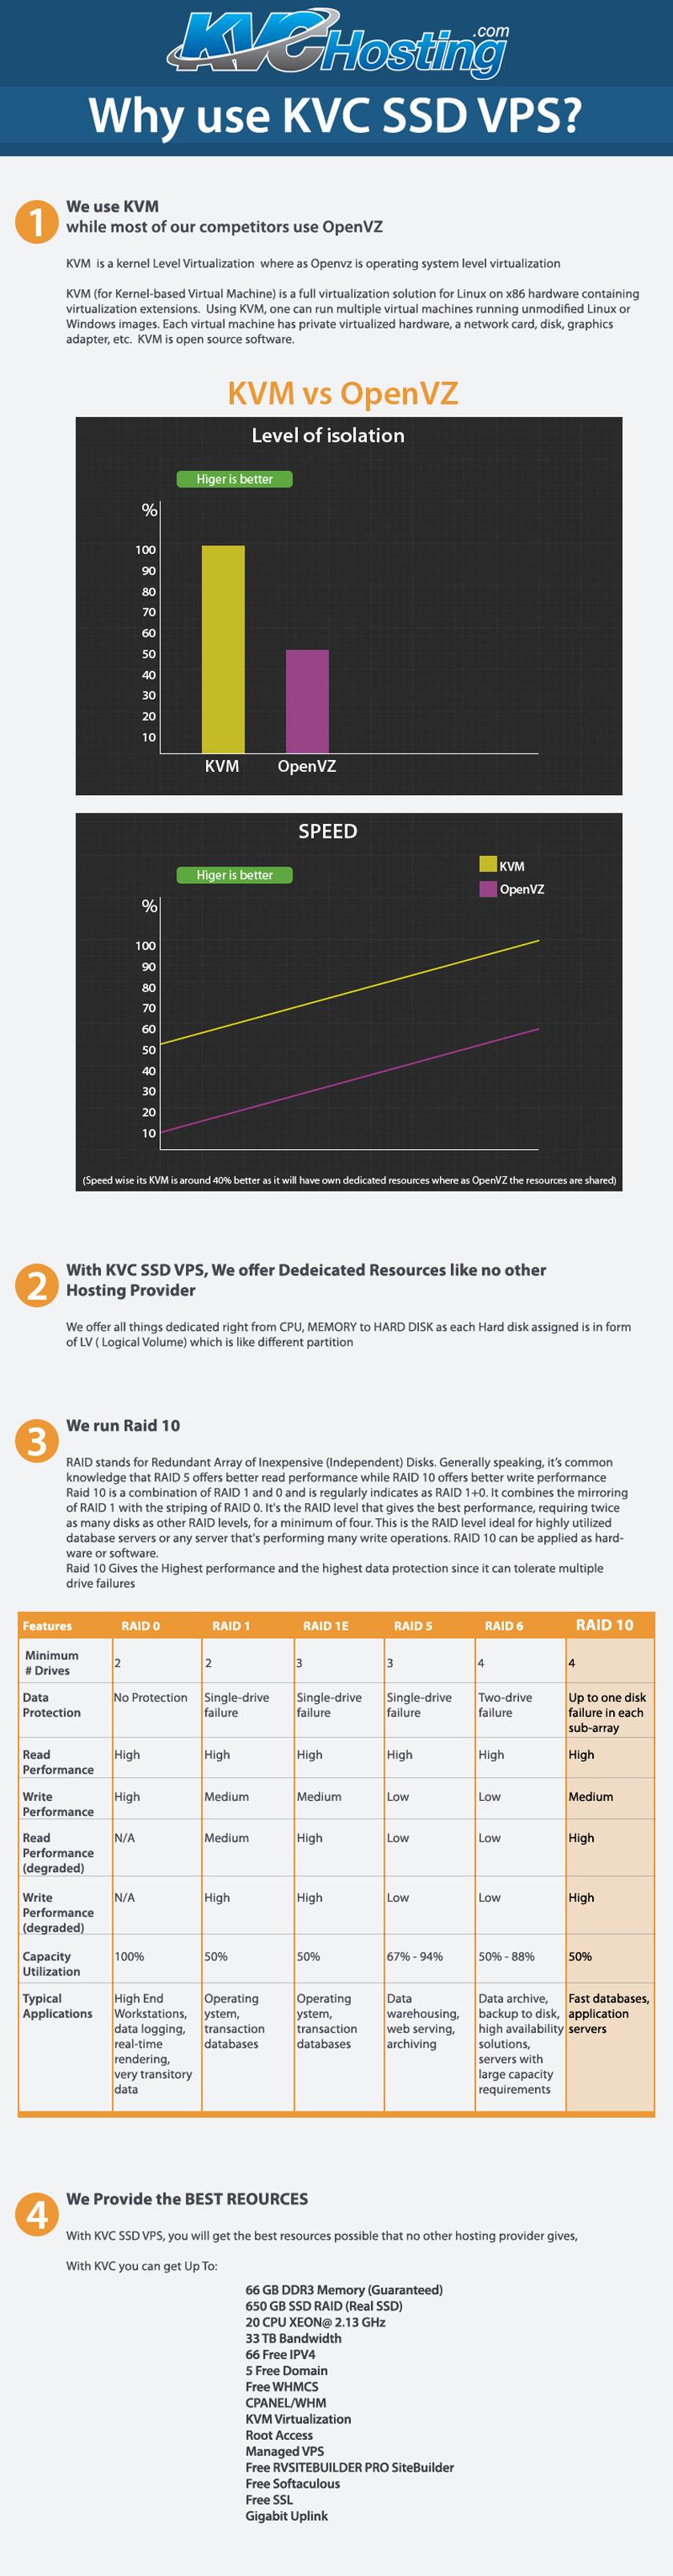 Cheap VPS Hosting | Enterprise SSD CLOUD VPS Hosting | SSD VPS Web